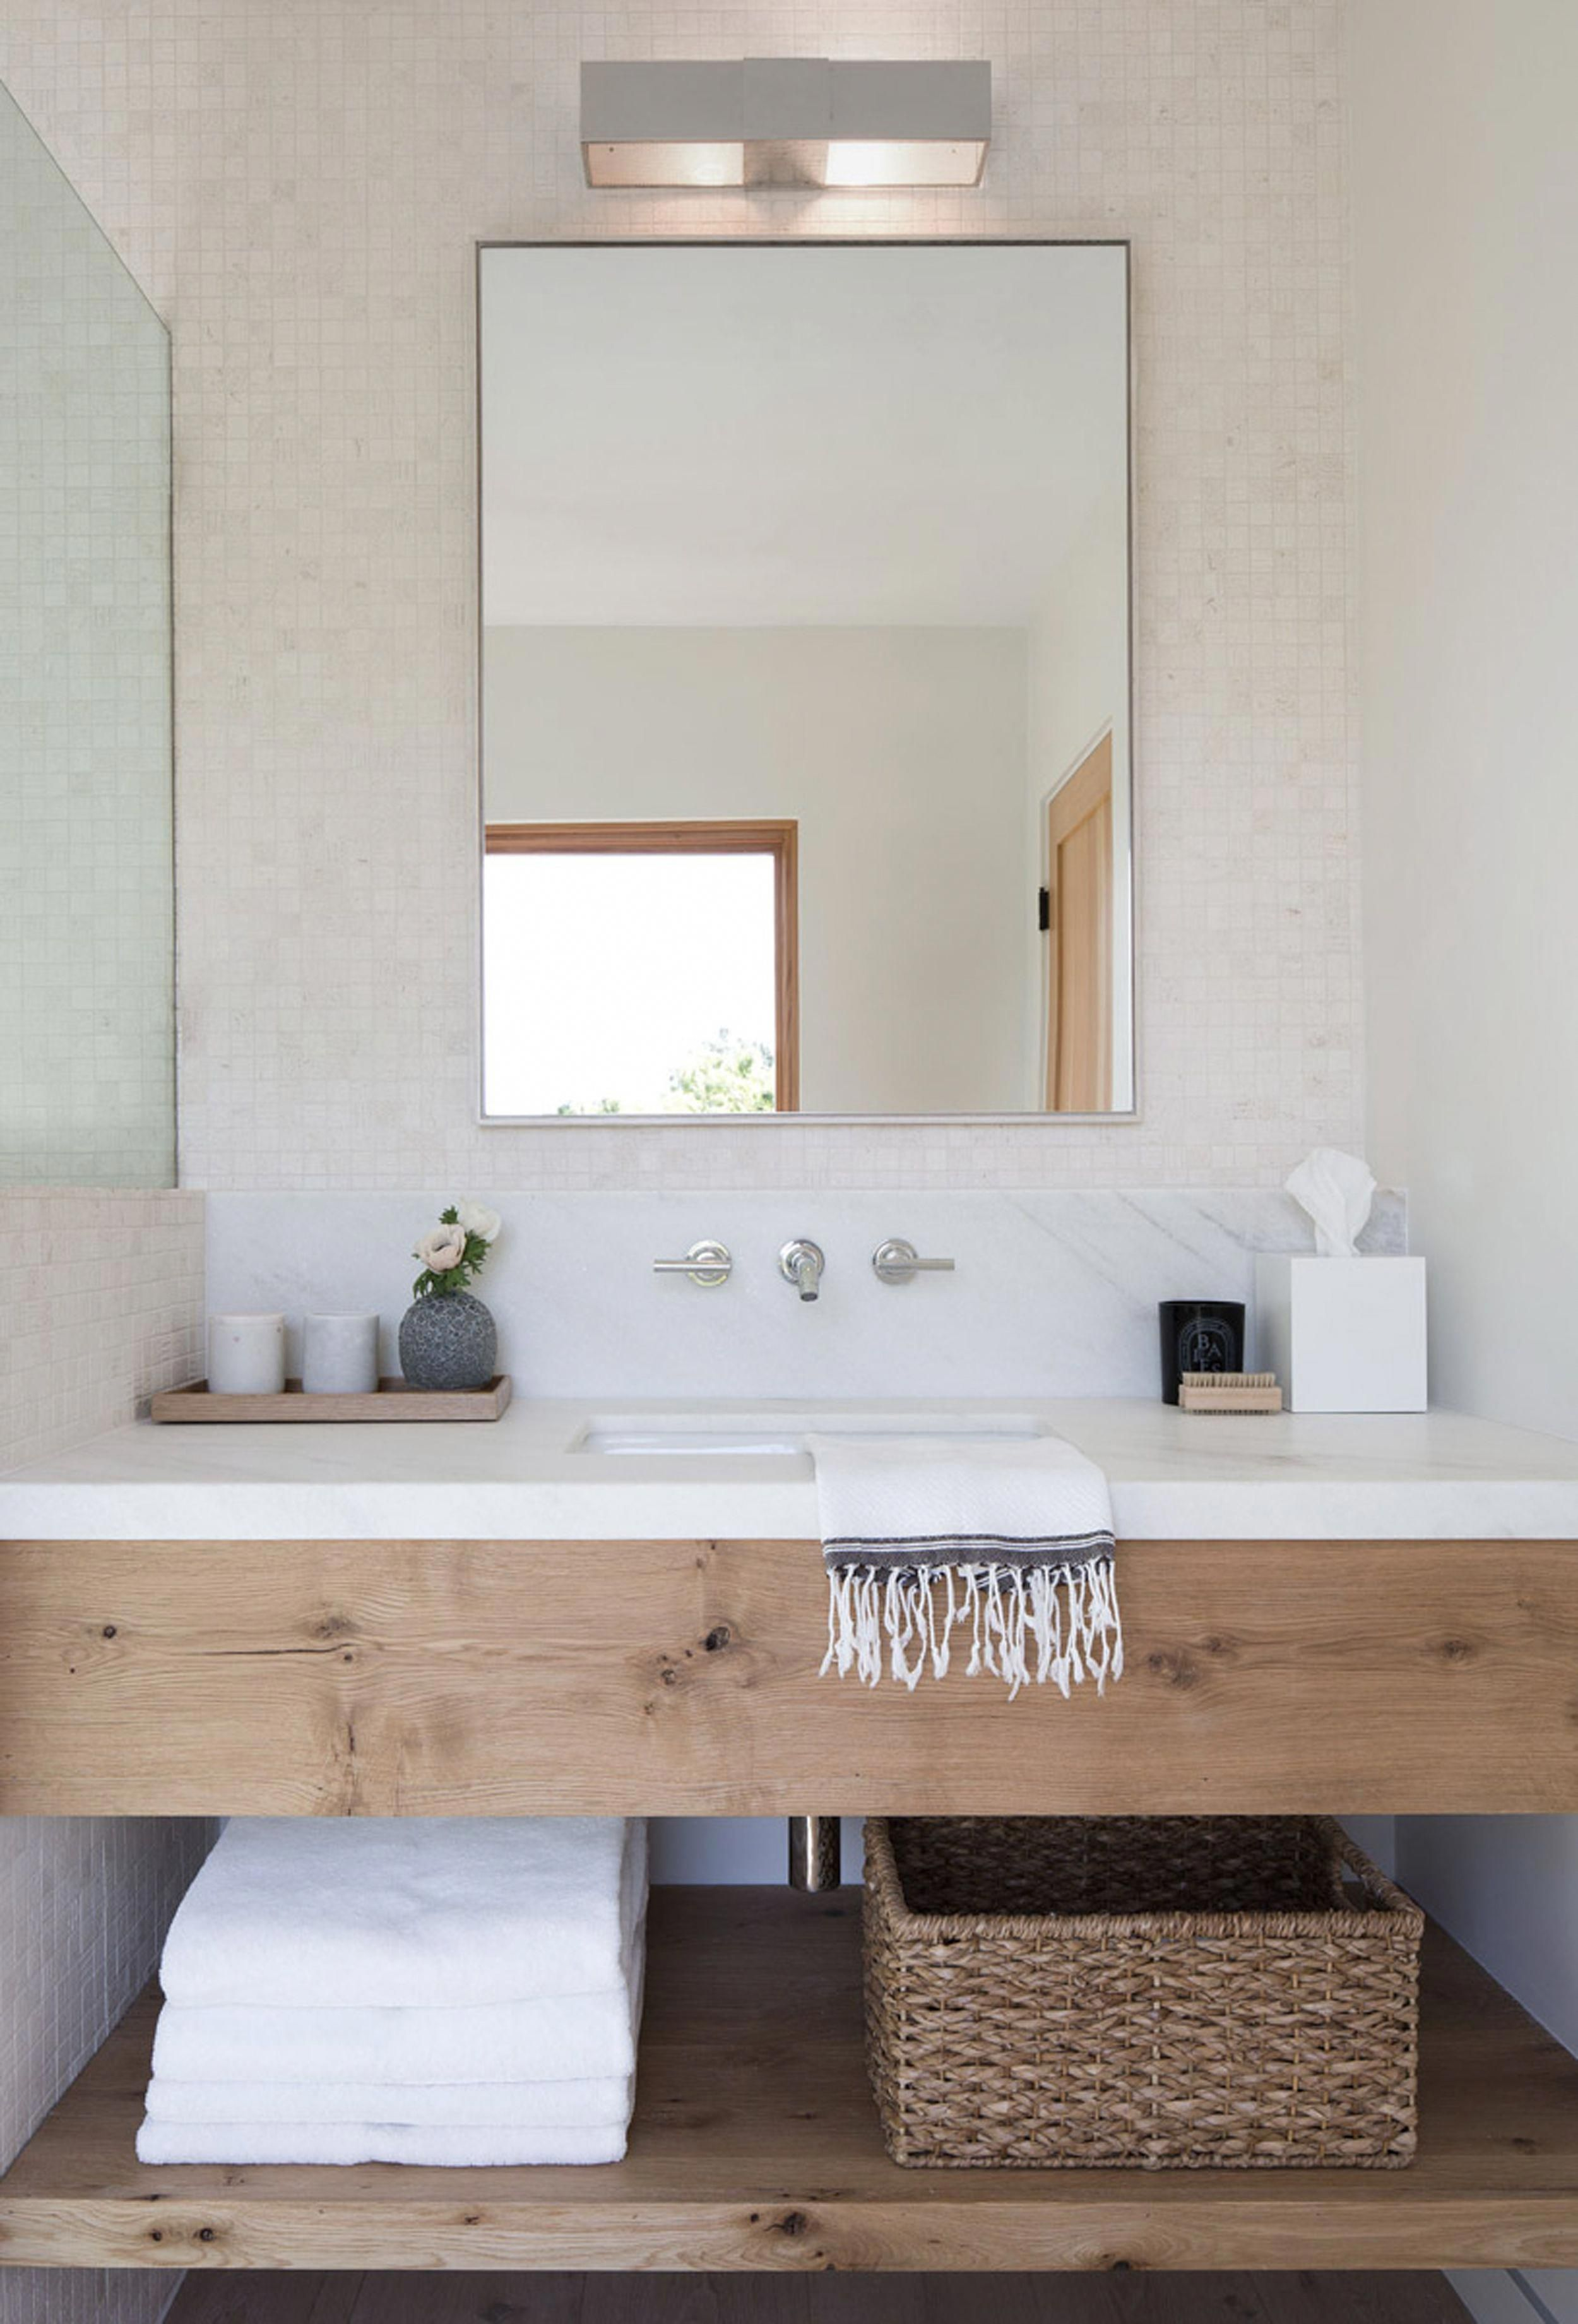 Natural Wood Vanity Under Mount Sink Bathroomdecorimages Bathroom Interior Bathrooms Remodel Bathroom Plans